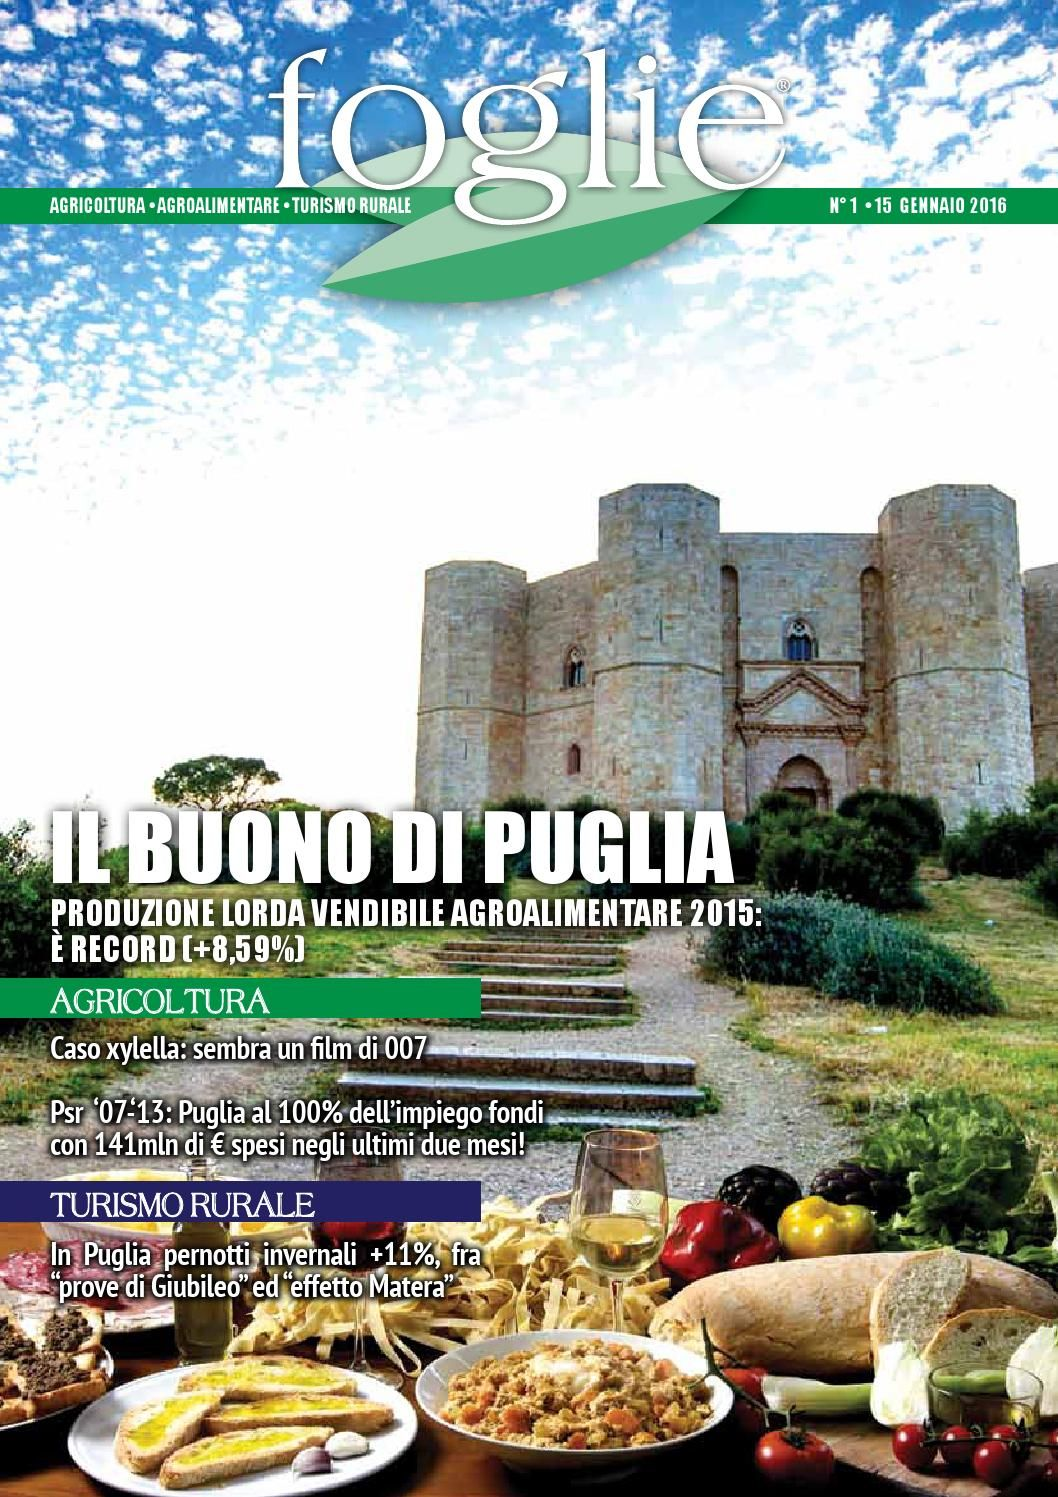 FOGLIE n.01/2016  AGRICOLTURA AGROALIMENTARE TURISMO RURALE